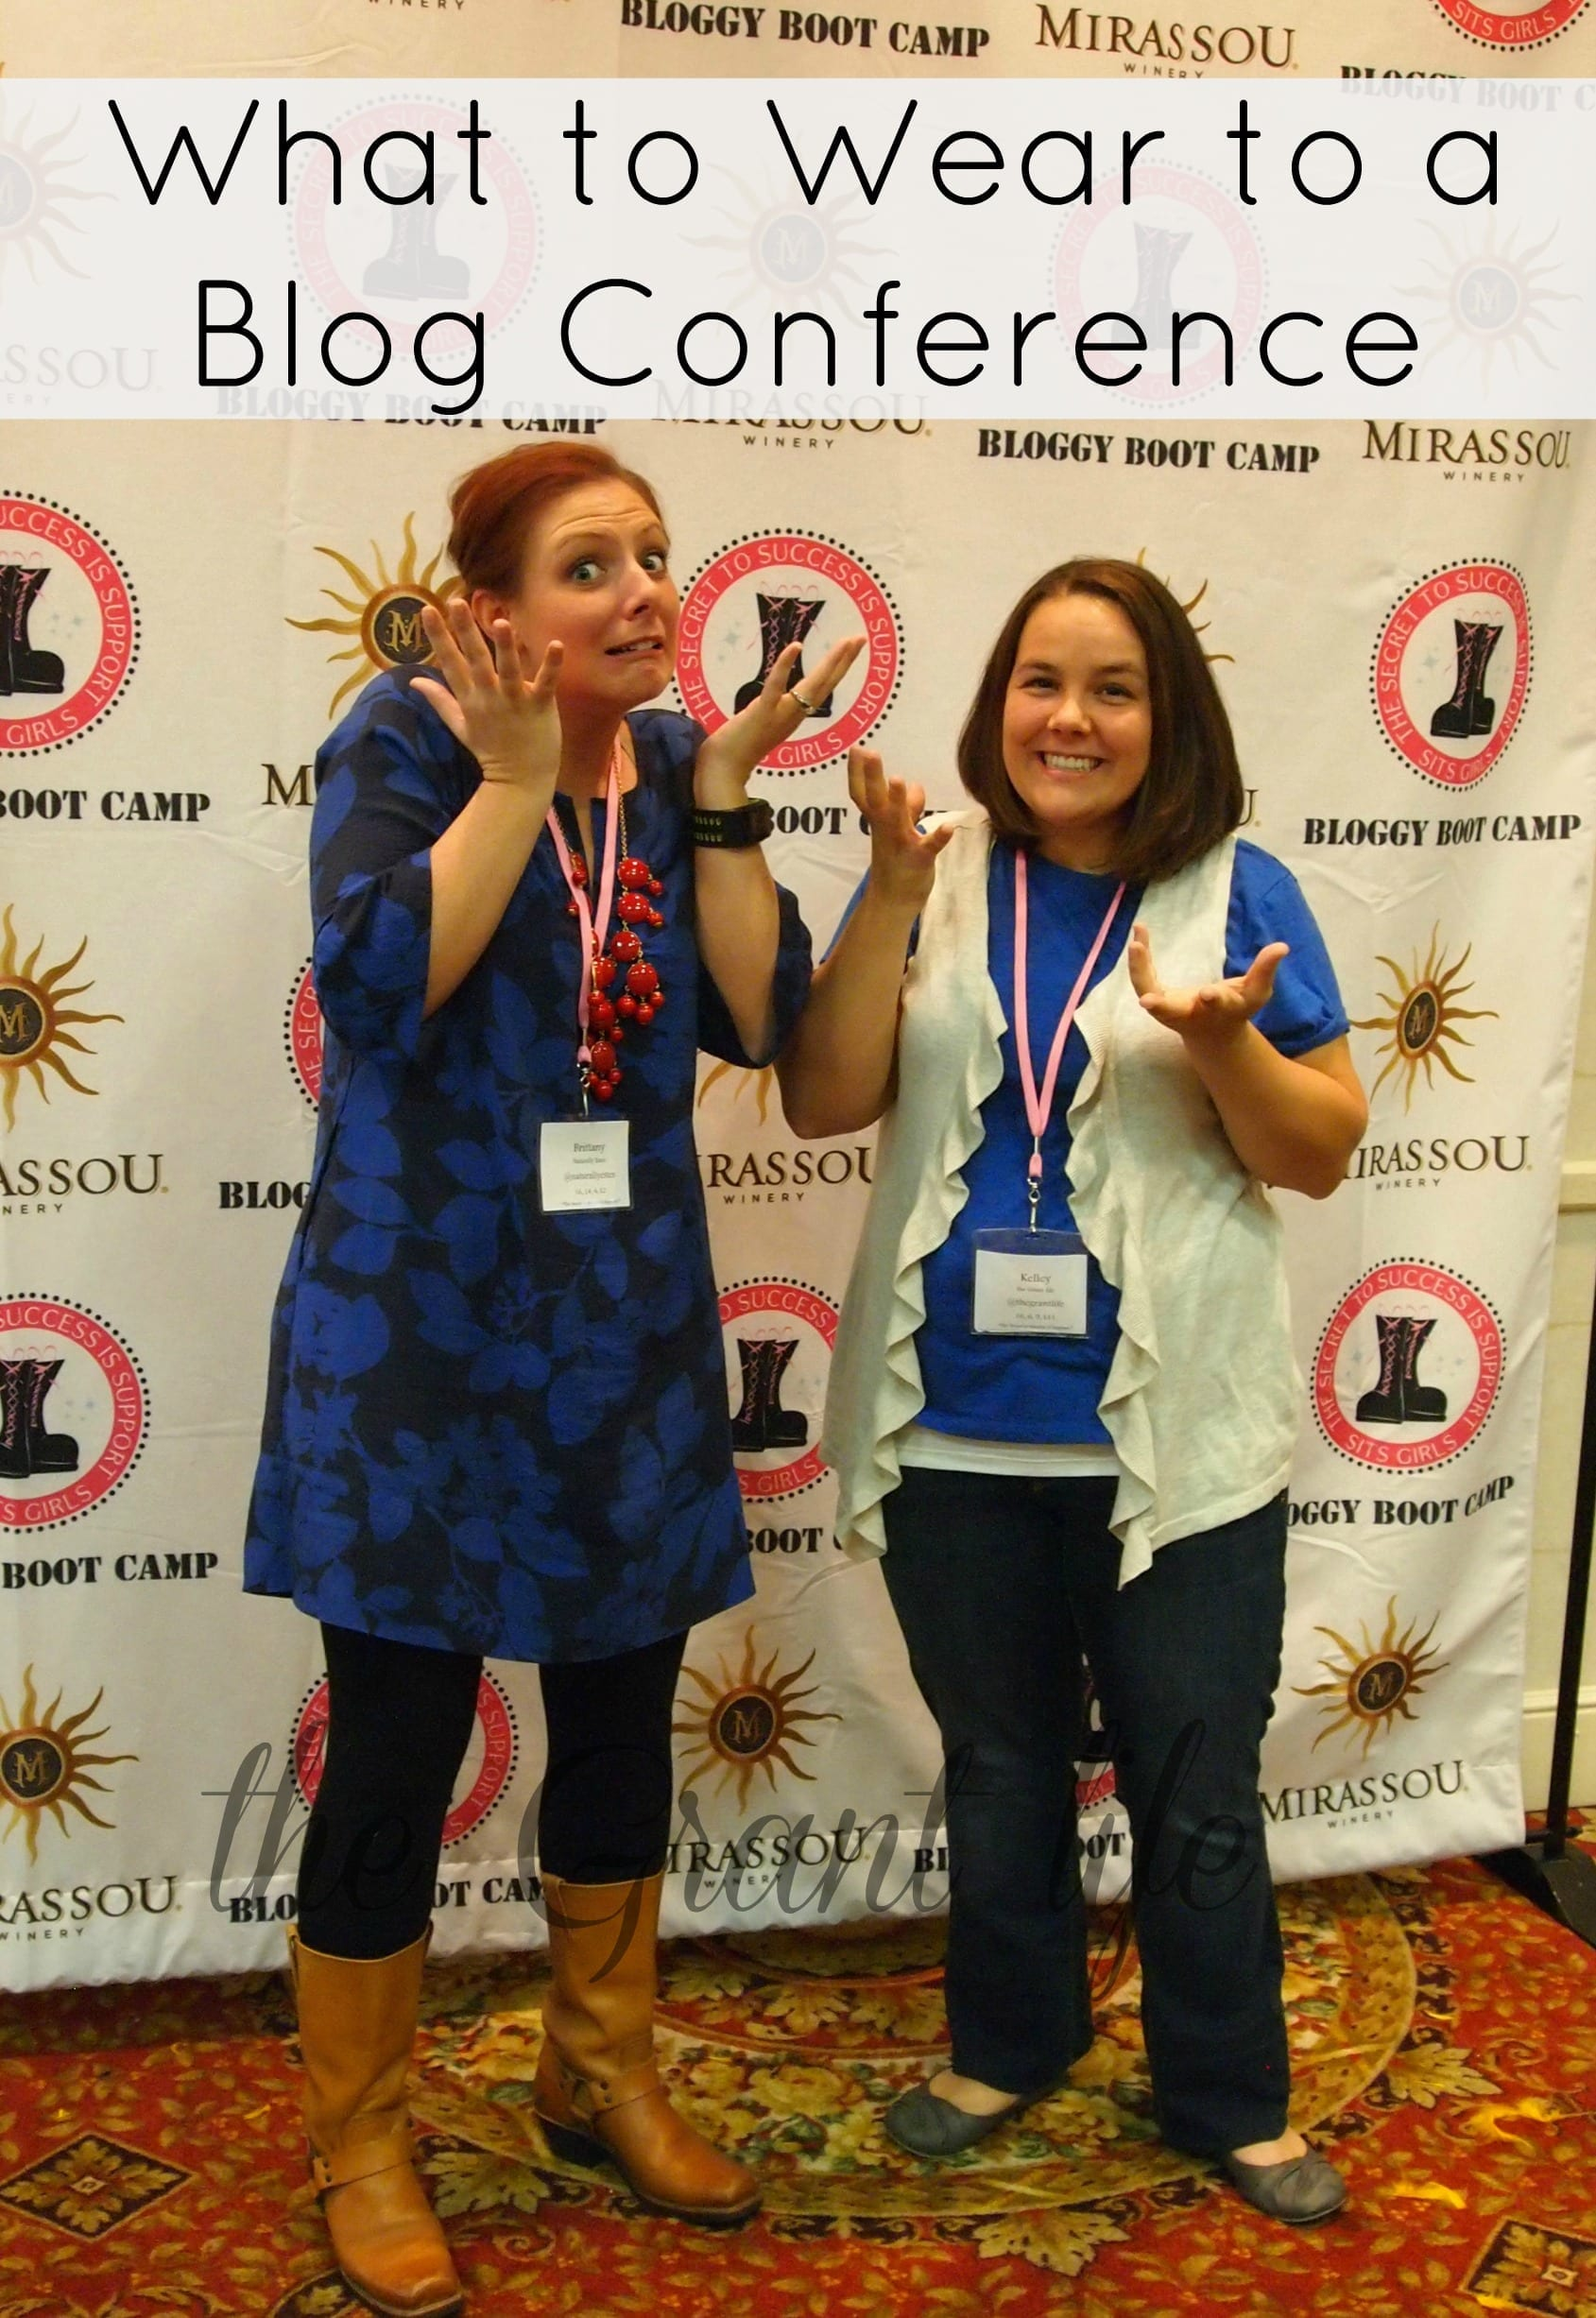 Conference Wear – Copy Cat Closet